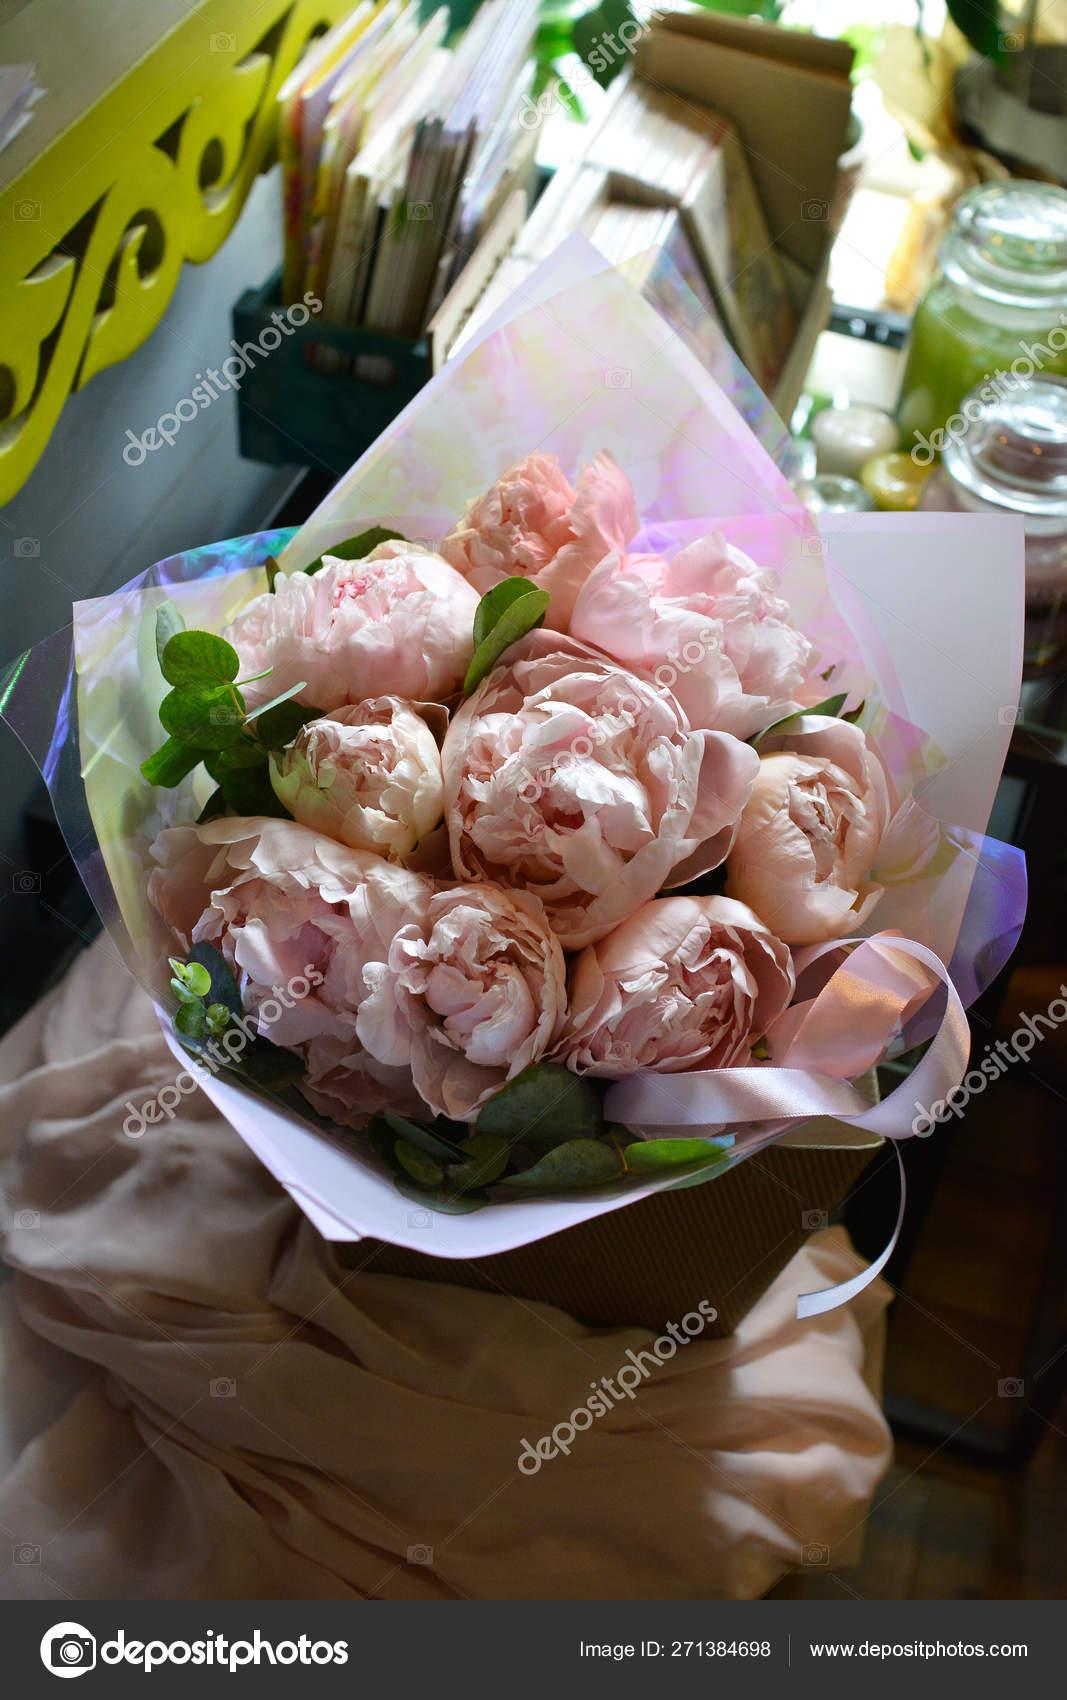 Flower Bouquet Flower Shop Bridal Salon Bouquet Wedding Rose Flower Stock Photo C Plan905 271384698